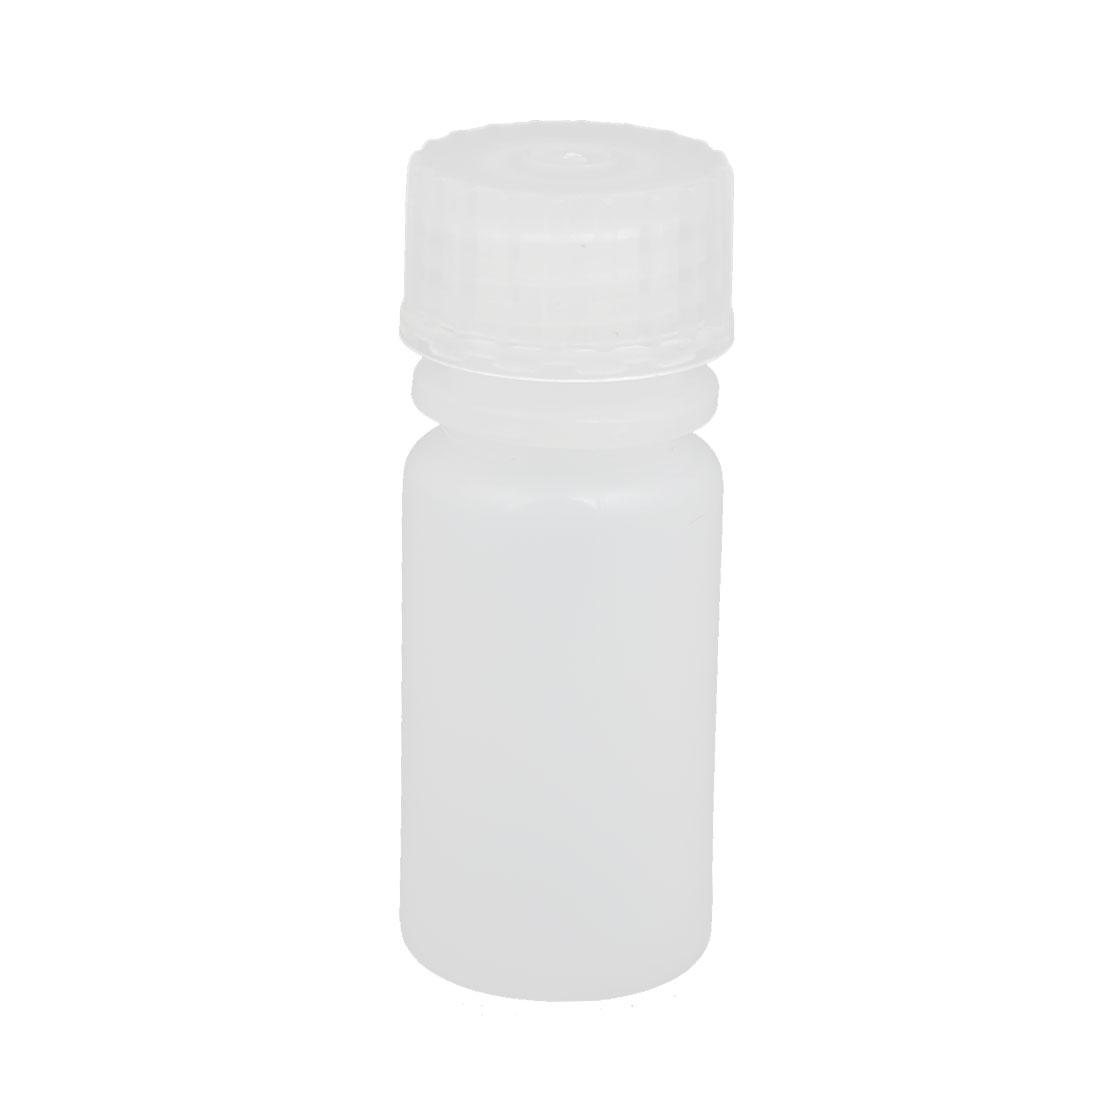 4ml Plastic Round Laboratory Reagent Bottle Sample Thicken Bottle White